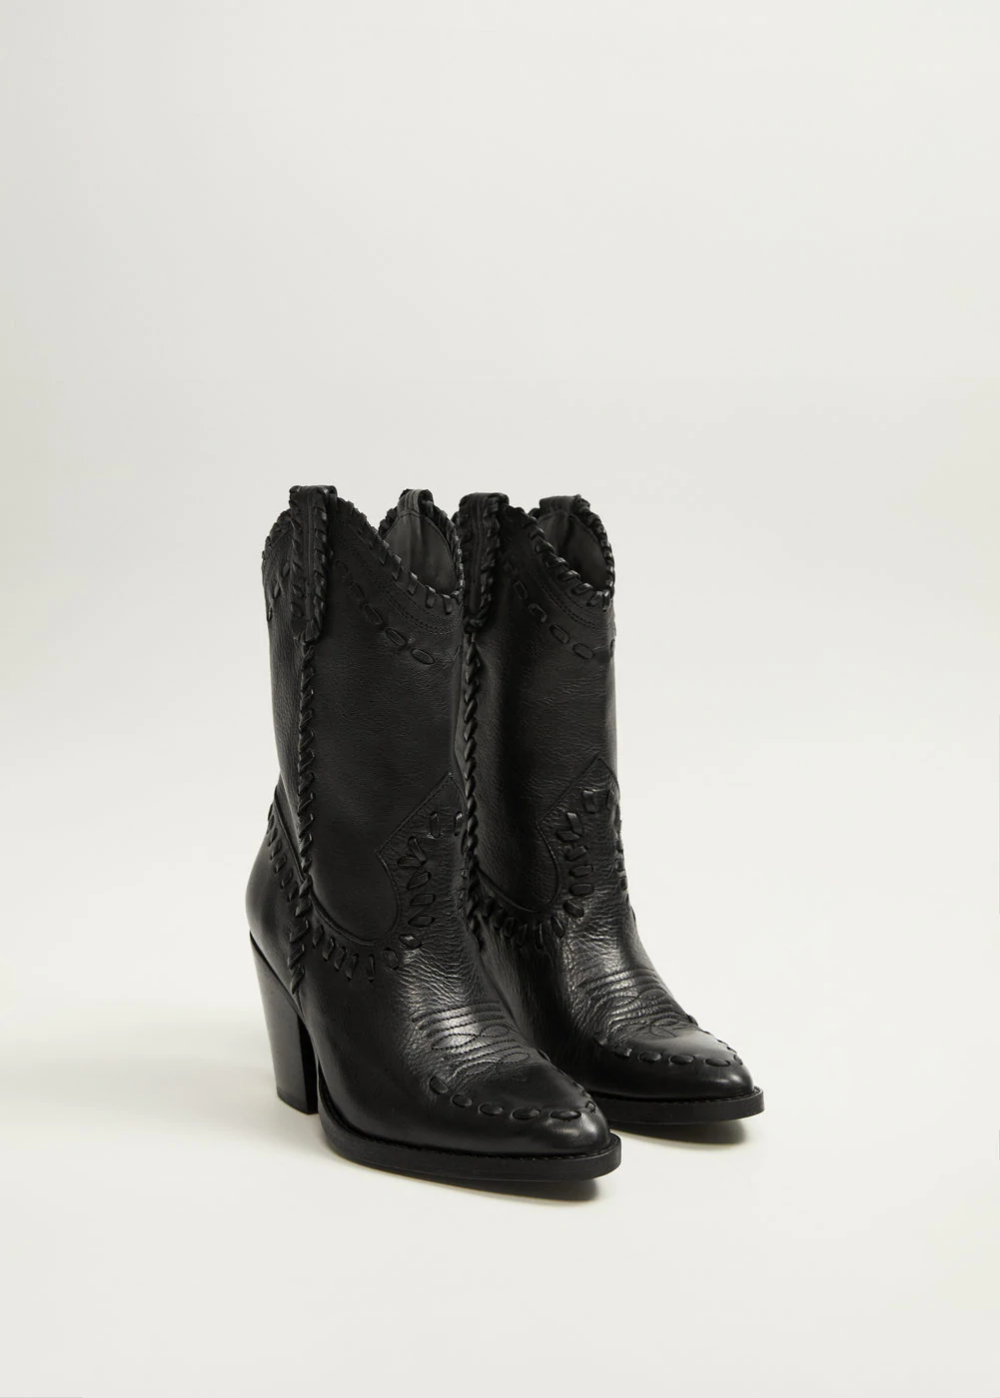 Skorzane Botki Cowboy Kobieta Mango Polska Womens Boots Ankle Boots Womens Boots